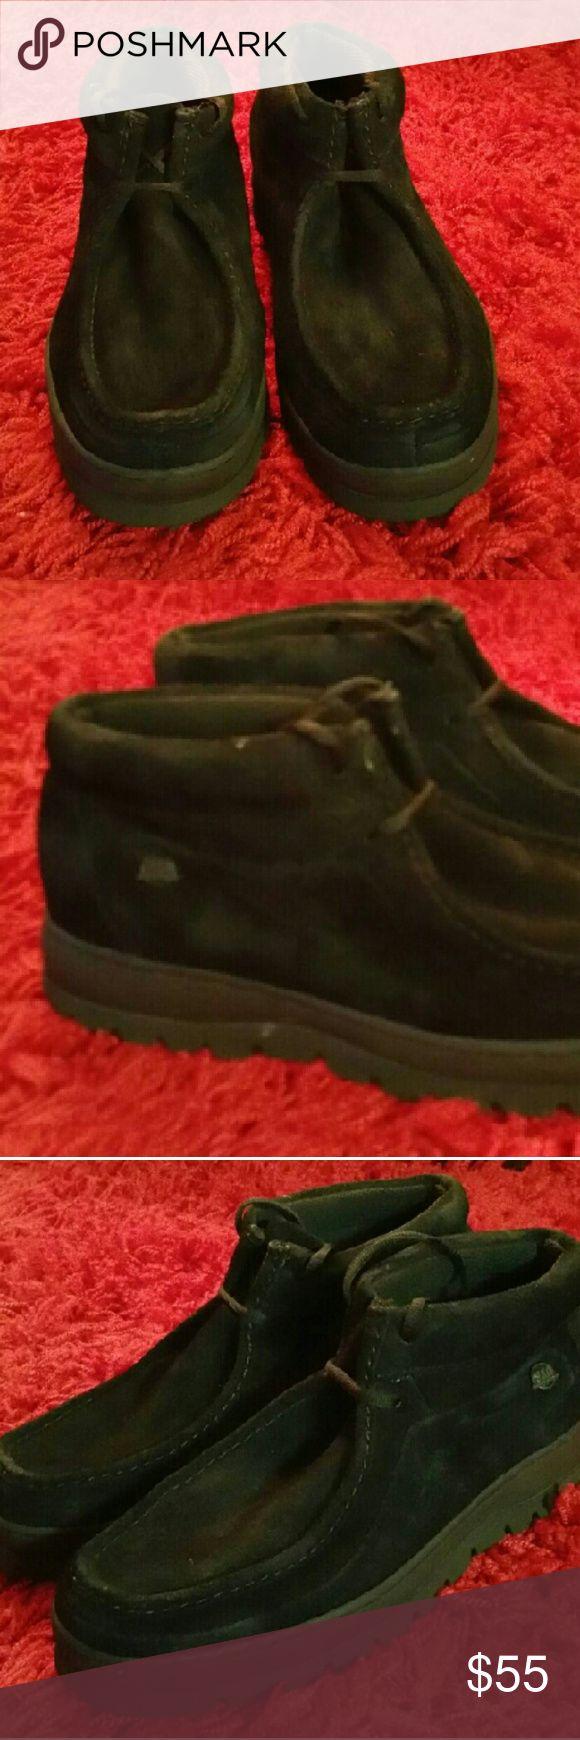 Fashion shoes for men Fashion shoes bucca bucci  Shoes Boat Shoes